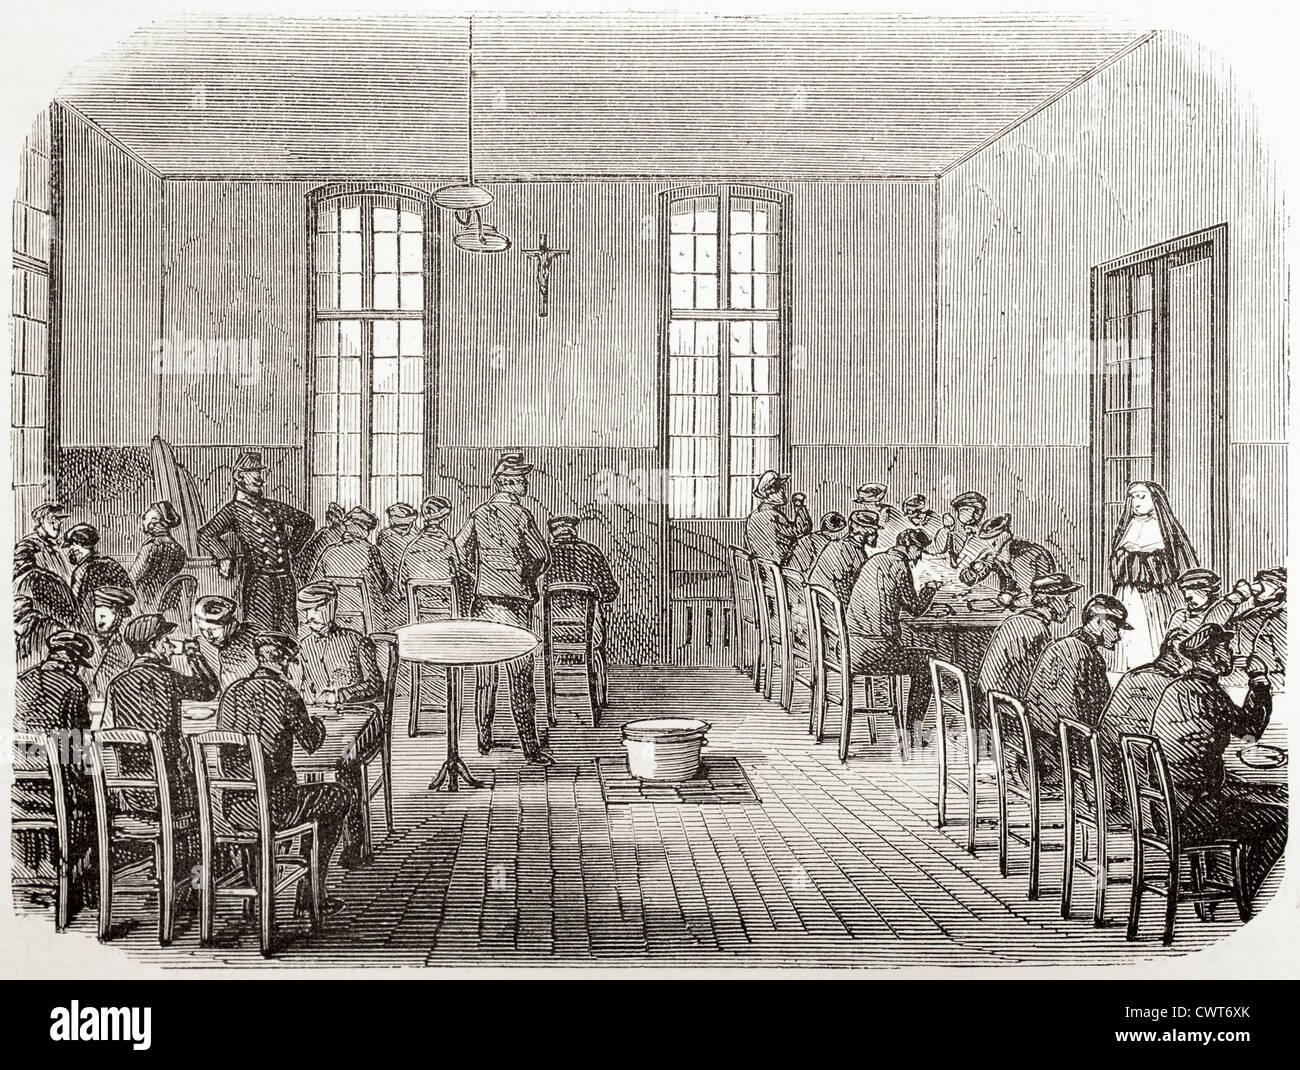 Refectory in Sainte Anne asylum - Stock Image